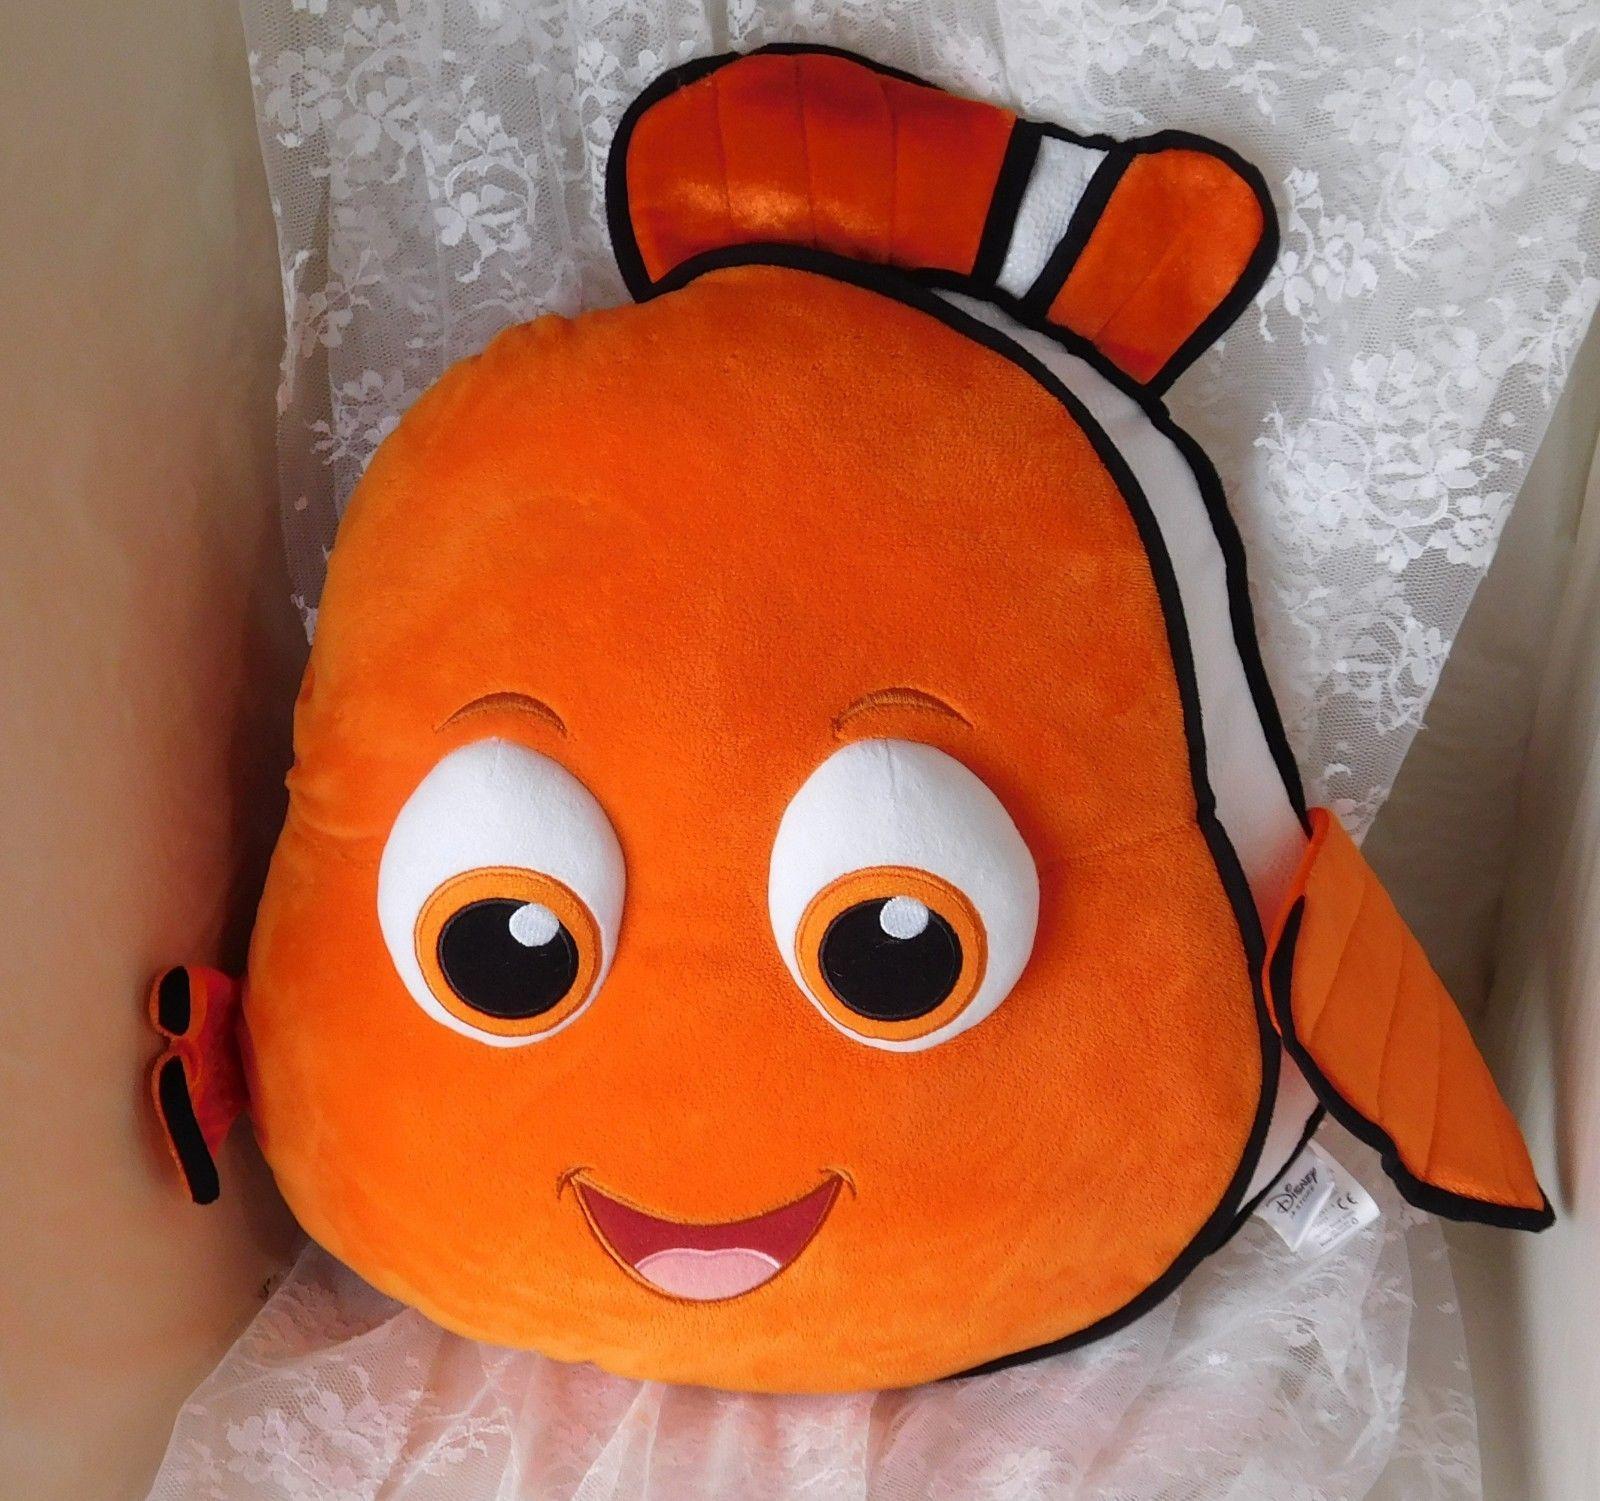 "Disney Store Plush Pillow - Extra Large Nemo from Finding Nemo - 20"" x 20"" x 2"" - $30.02"